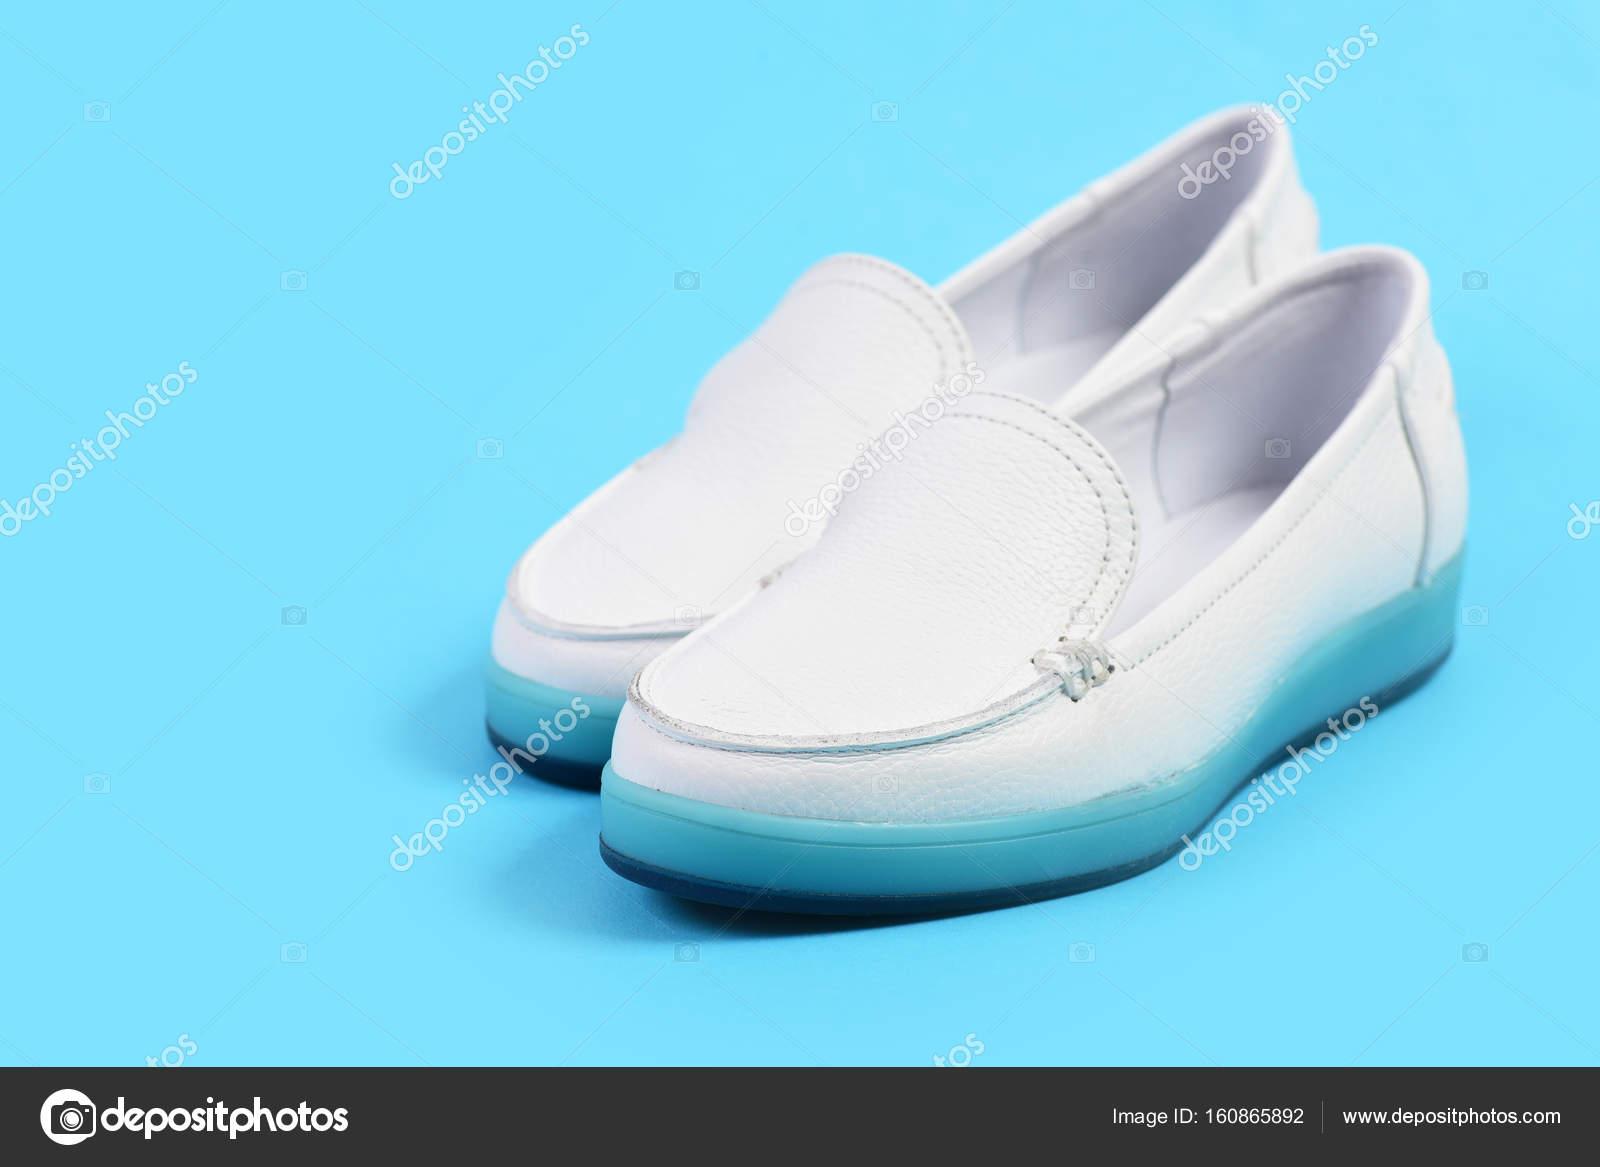 4c4751bb7d8 Χαμηλό τακούνι παπούτσια σε στυλ αθλητικών. Μοκασίνια για γυναίκες ...